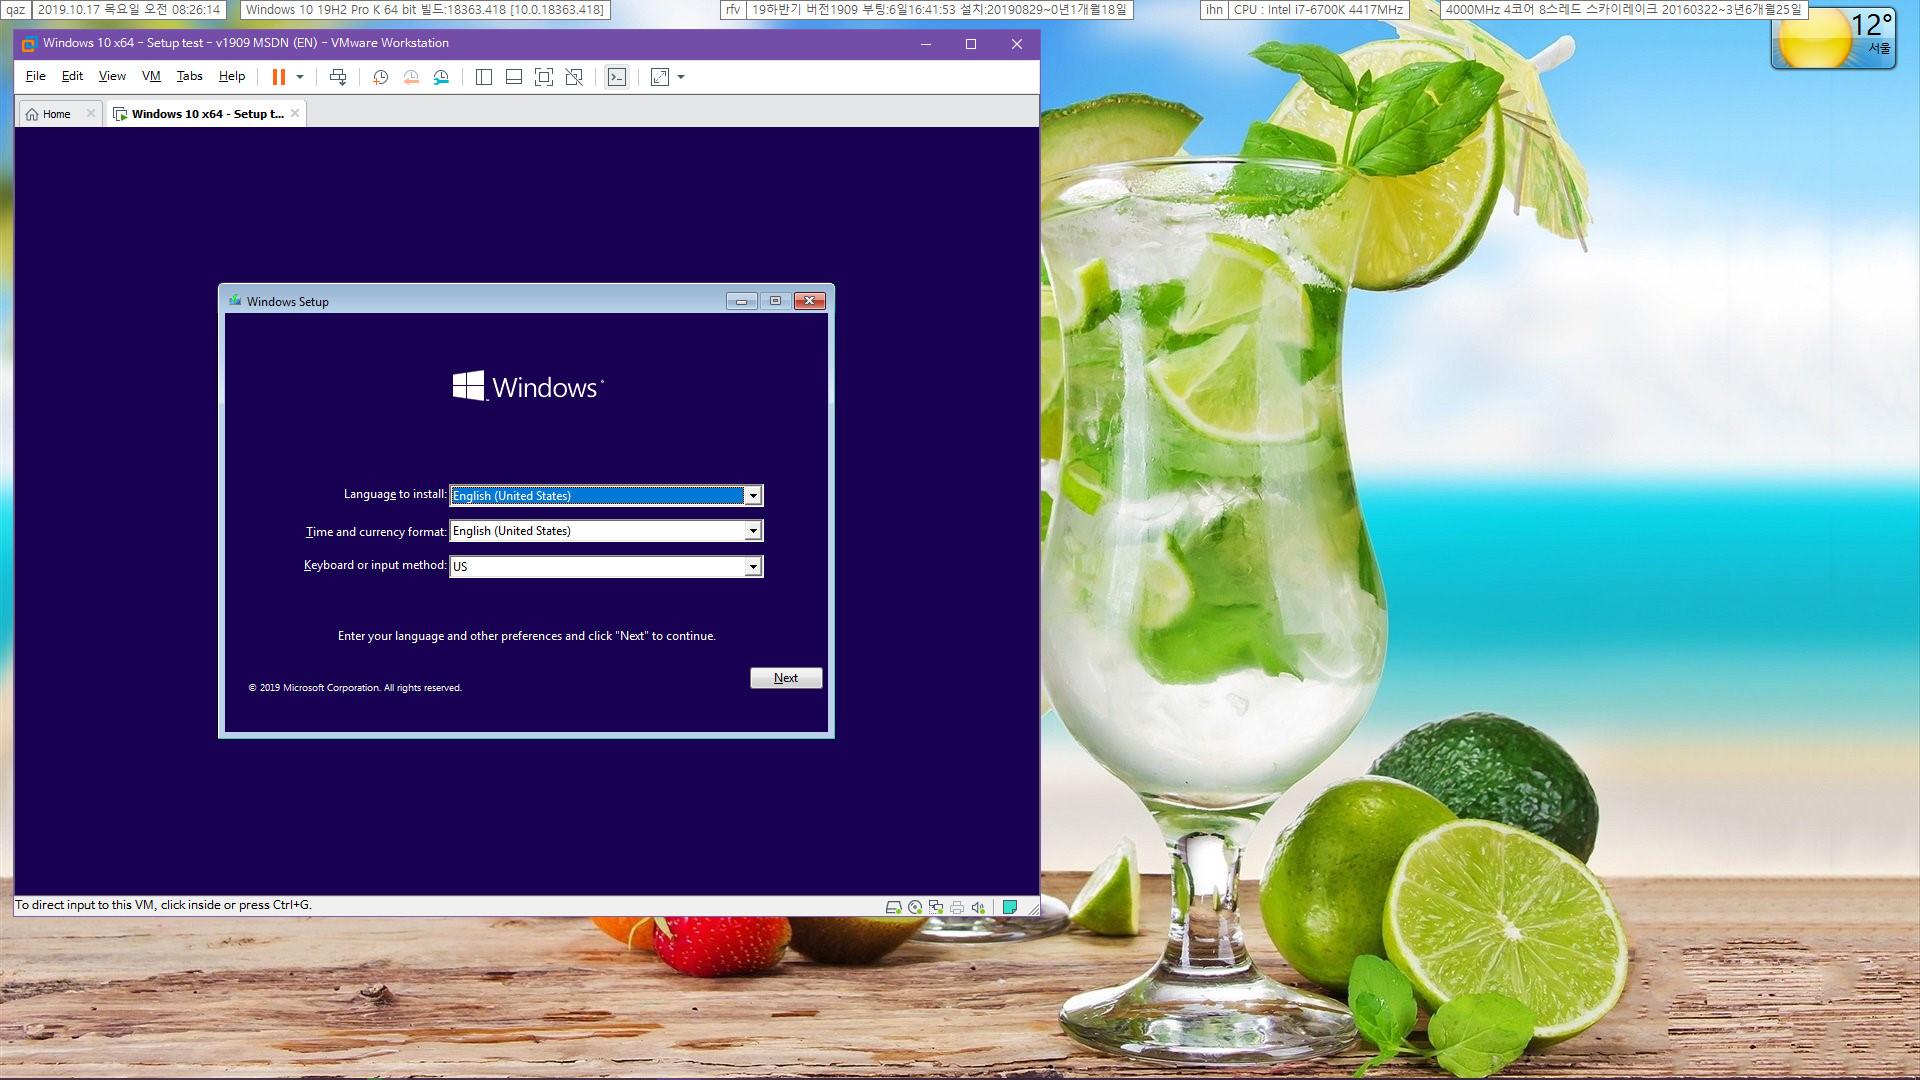 Windows 10 버전 1909 (OS빌드 18363.418) 코드네임 19H2 첫 MSDN 영문판 나왔네요 - 이미지 정보 - 여전히 버전 1903 의 업데이트 통합판에  KB4517245 추가 통합한 것 뿐입니다 - 설치 테스트 2019-10-17_082614.jpg